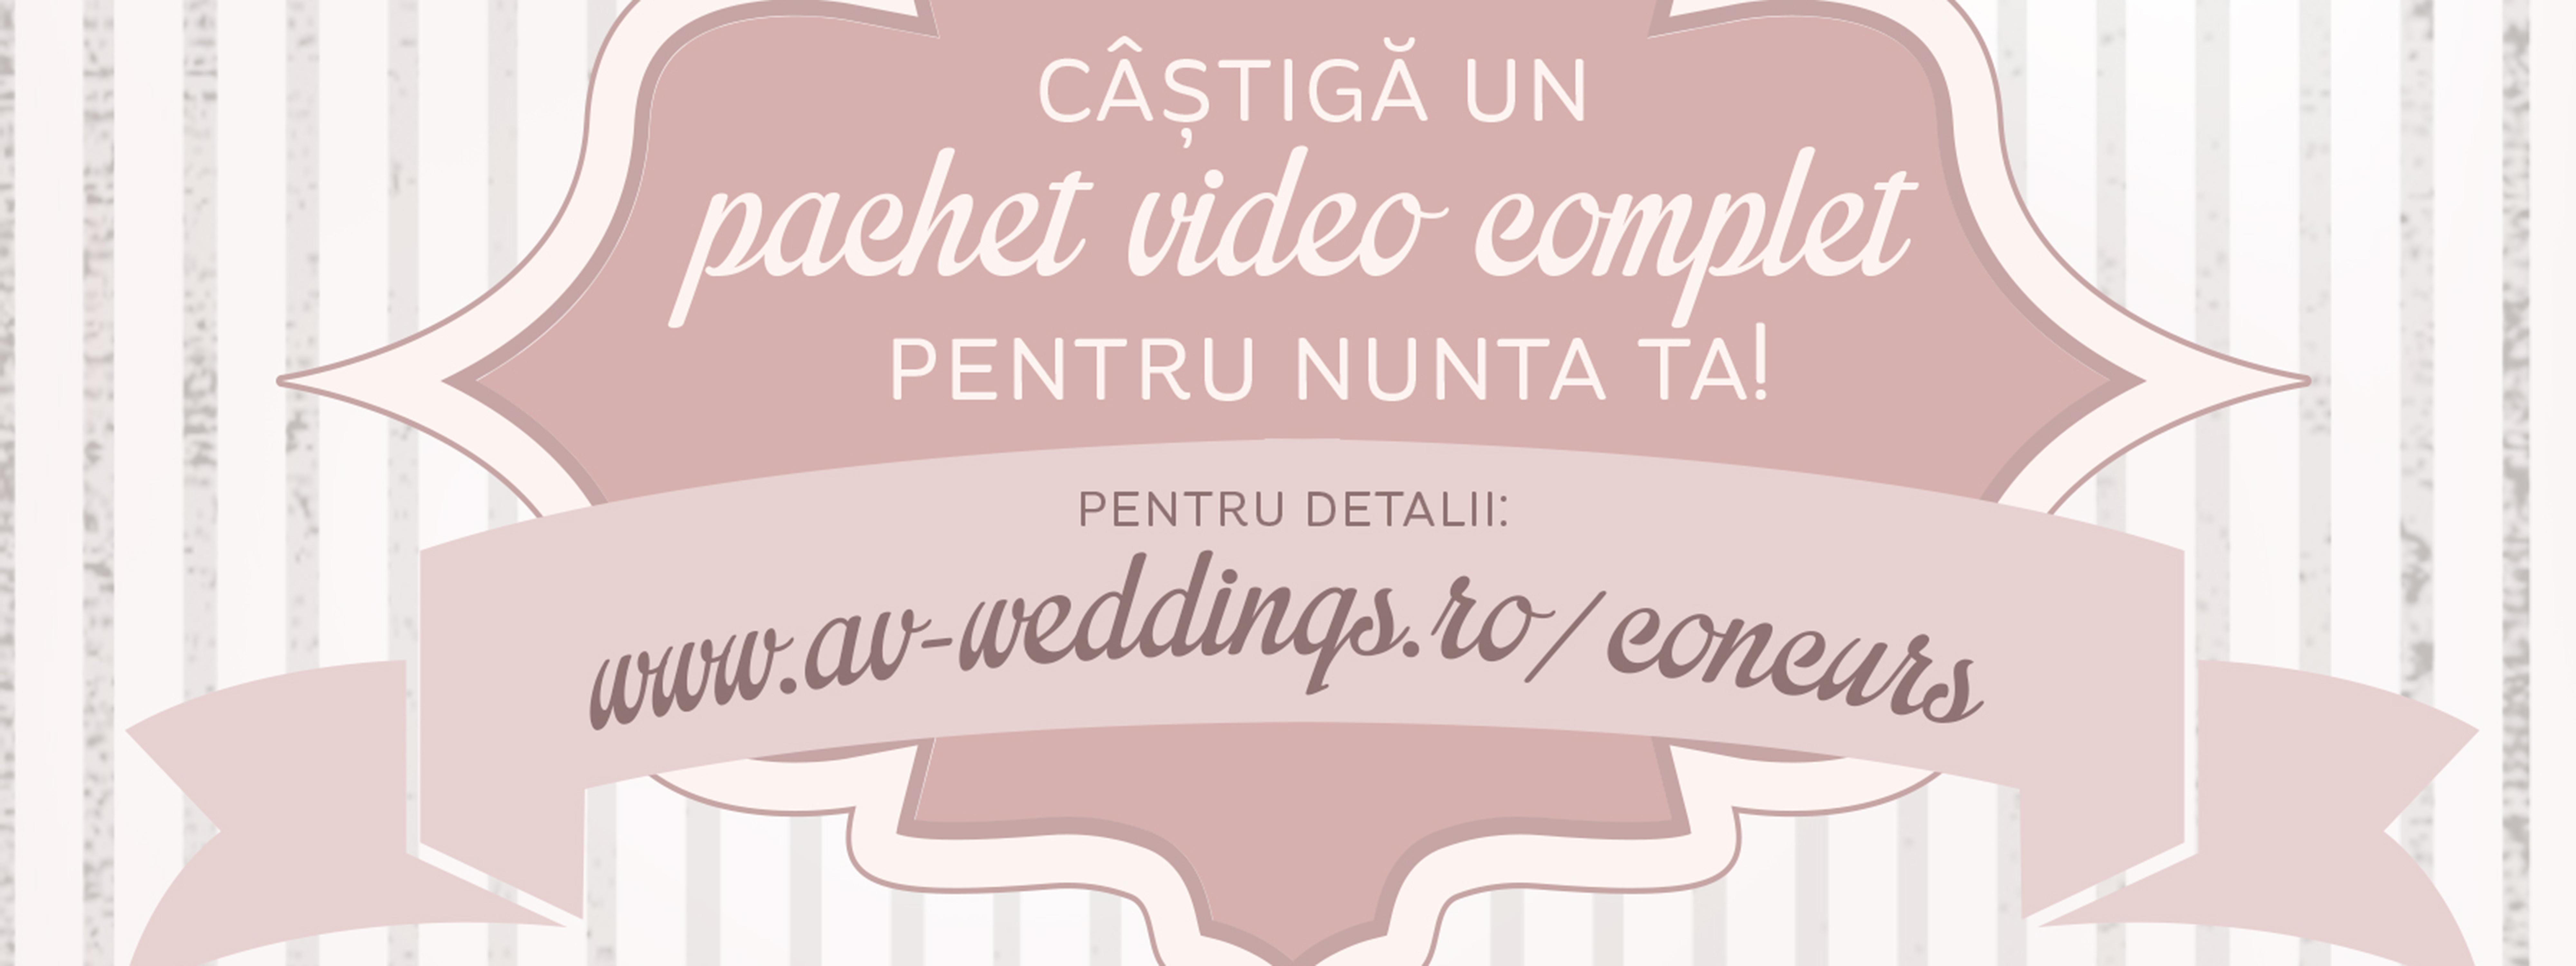 De ce sa participati la concursul organizat de AV Weddings